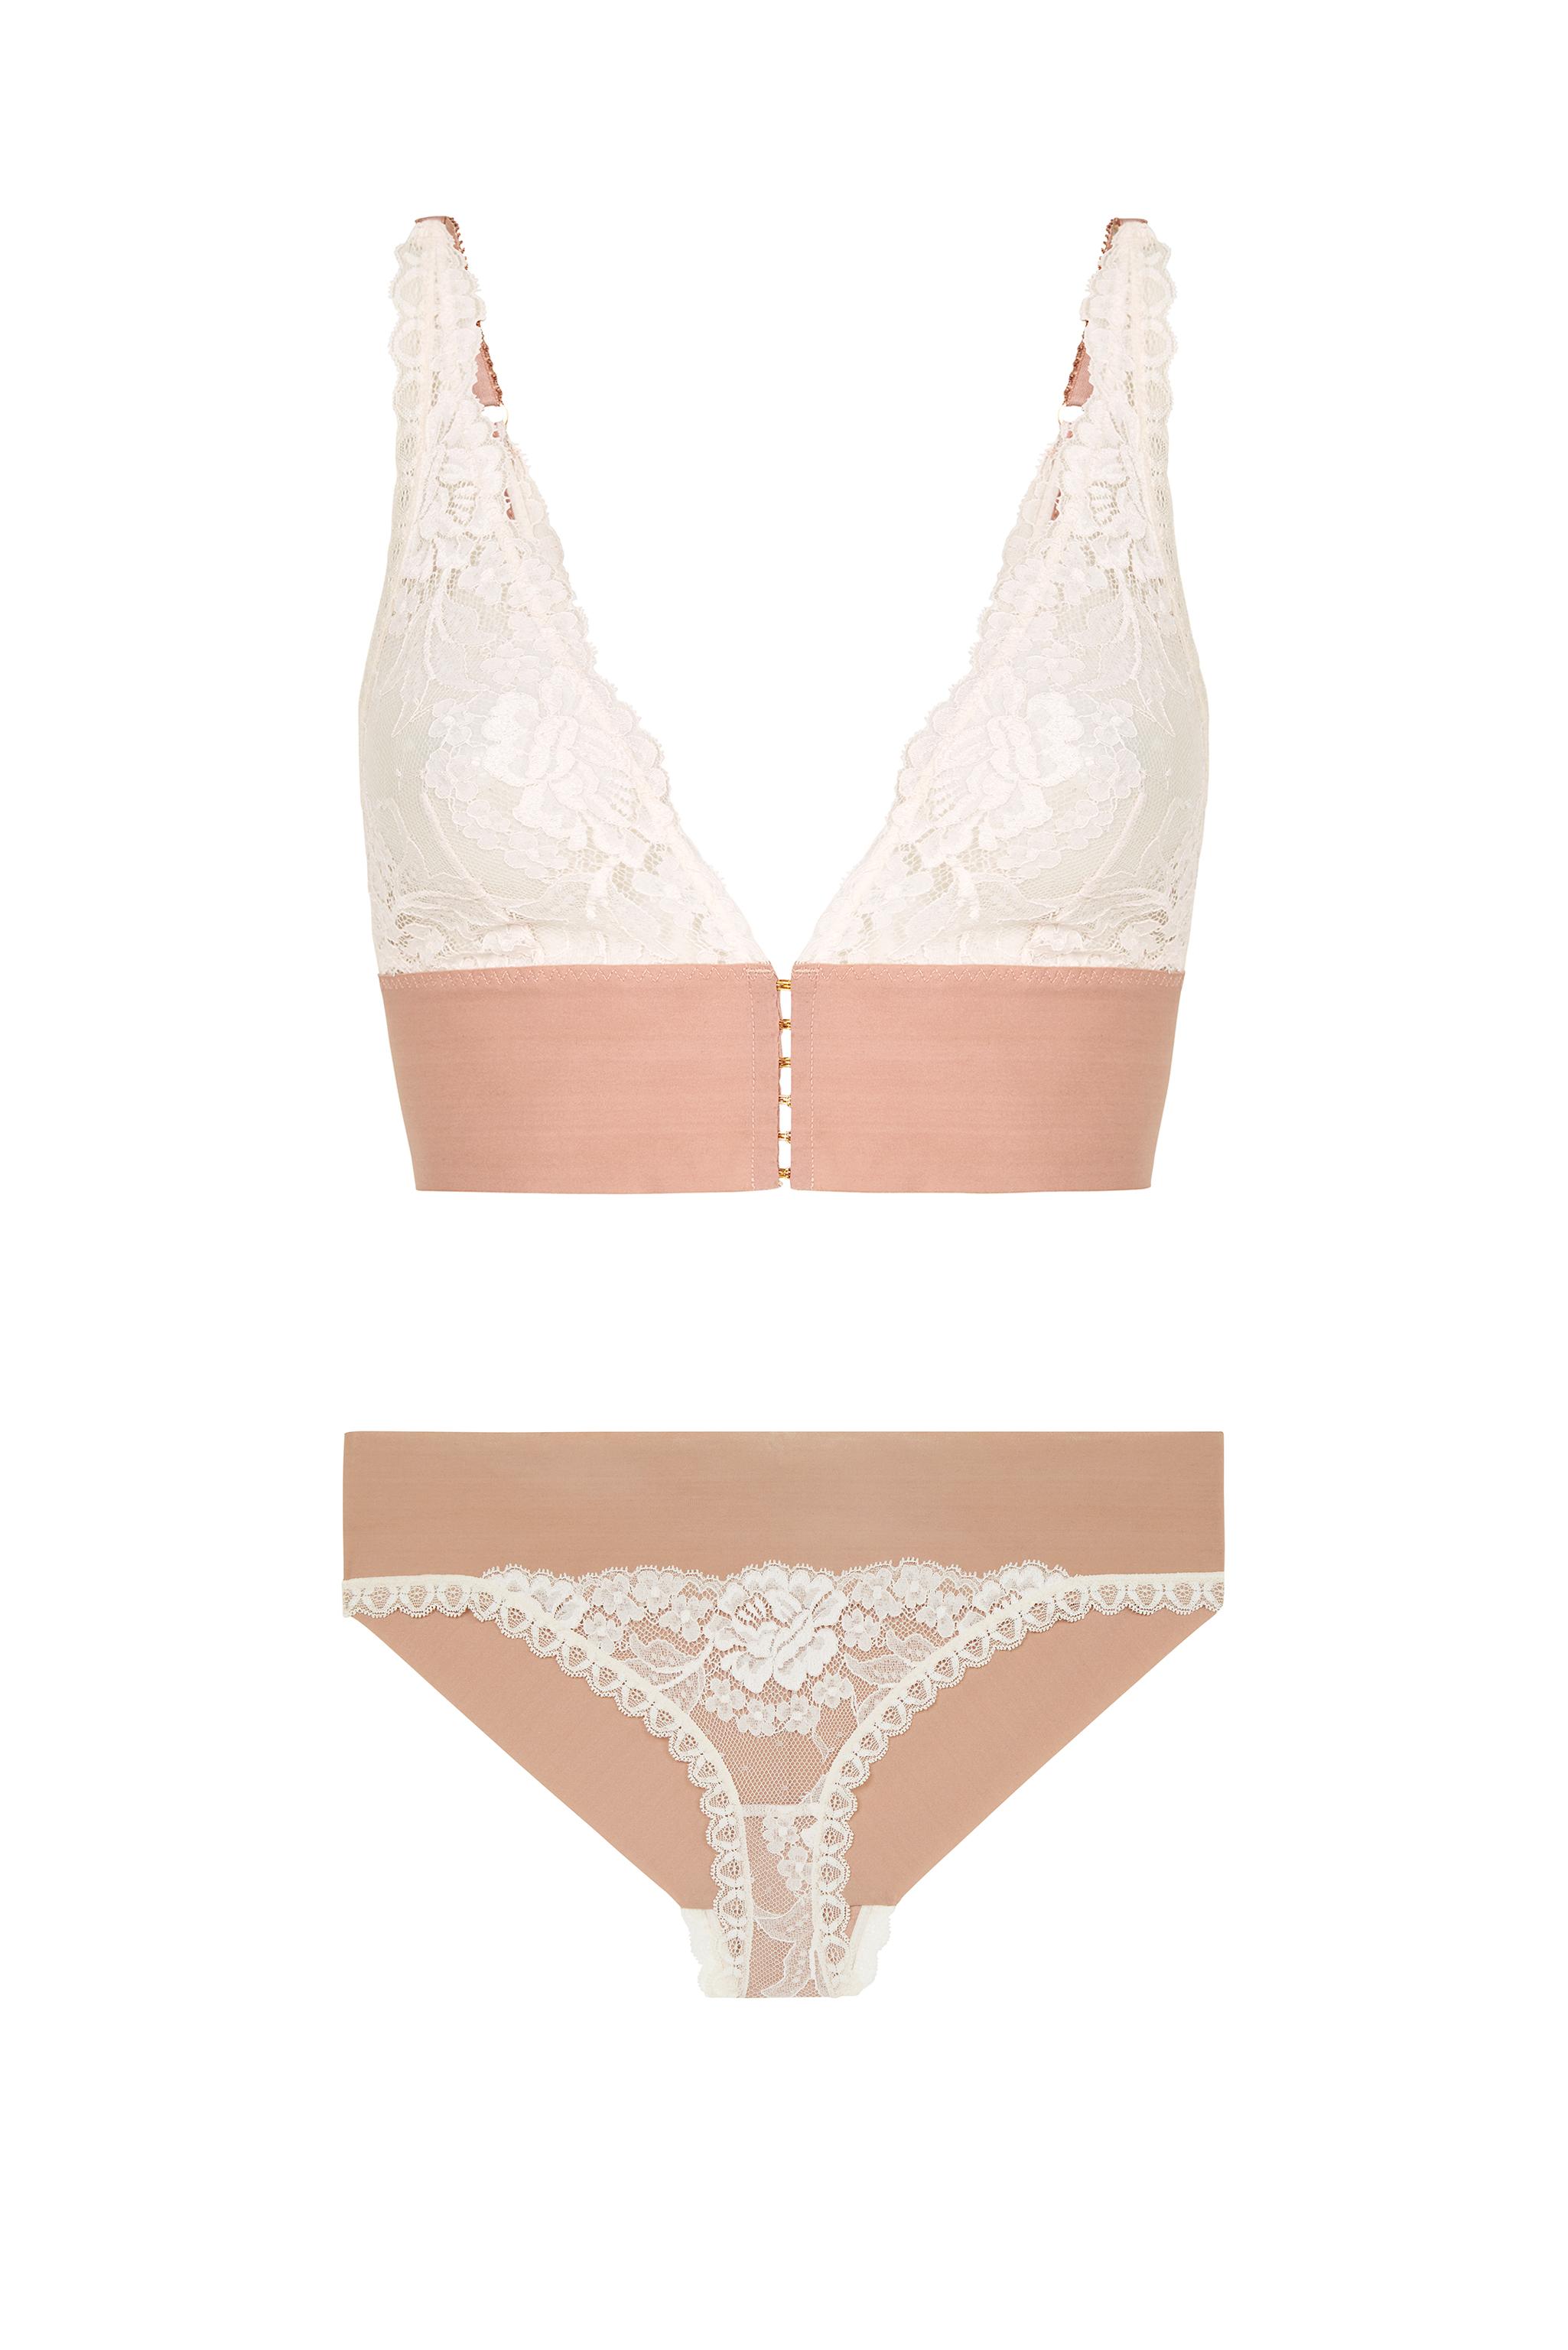 stella-mccartney-lingerie ss17 bella-admiring soft-cup-bra-s21-306- d46d66aaf0852